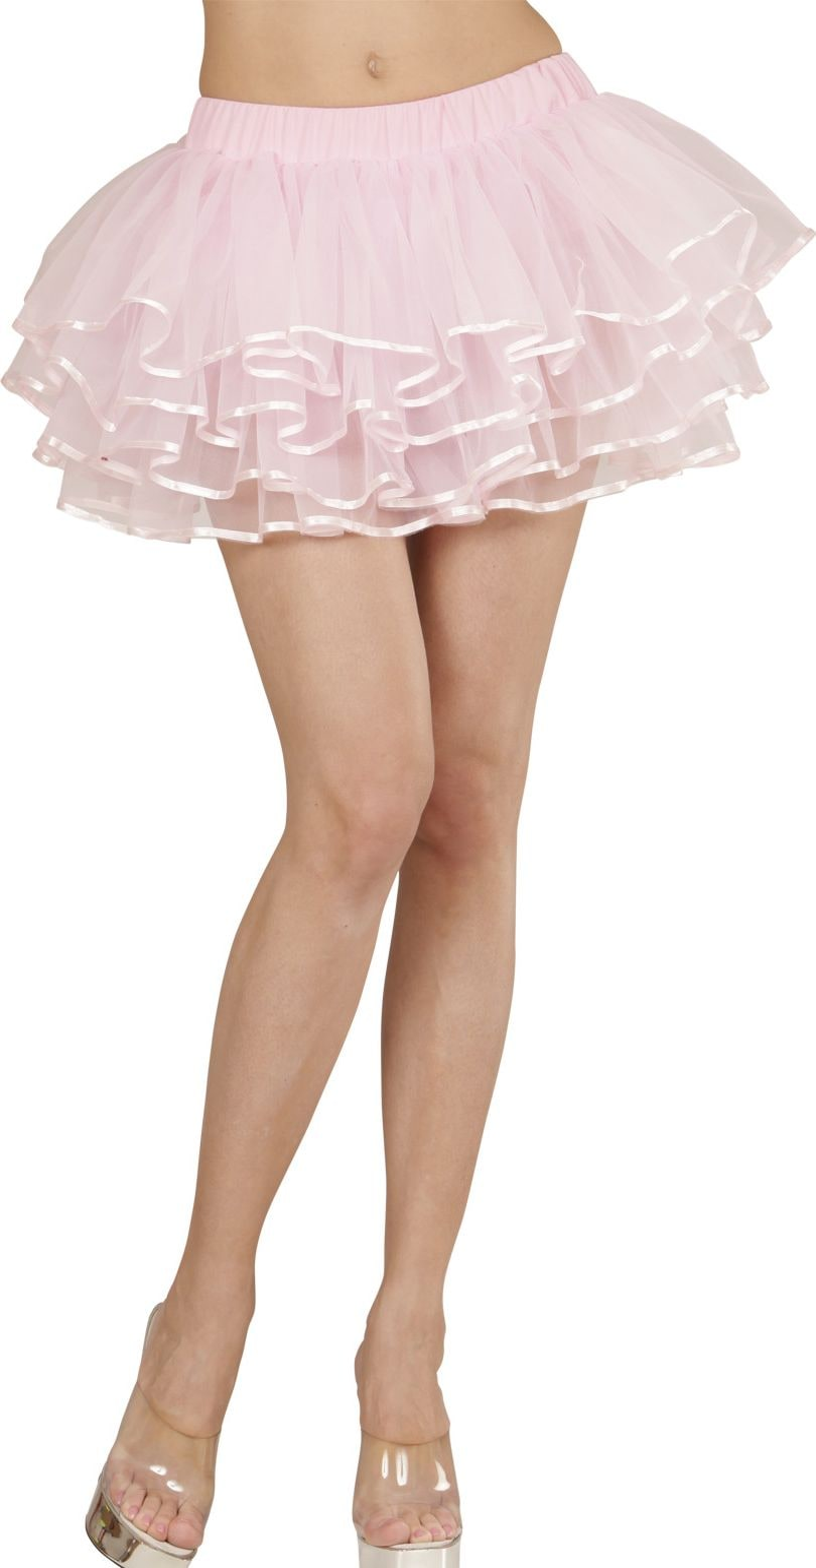 Roze luxe ballerina rokje